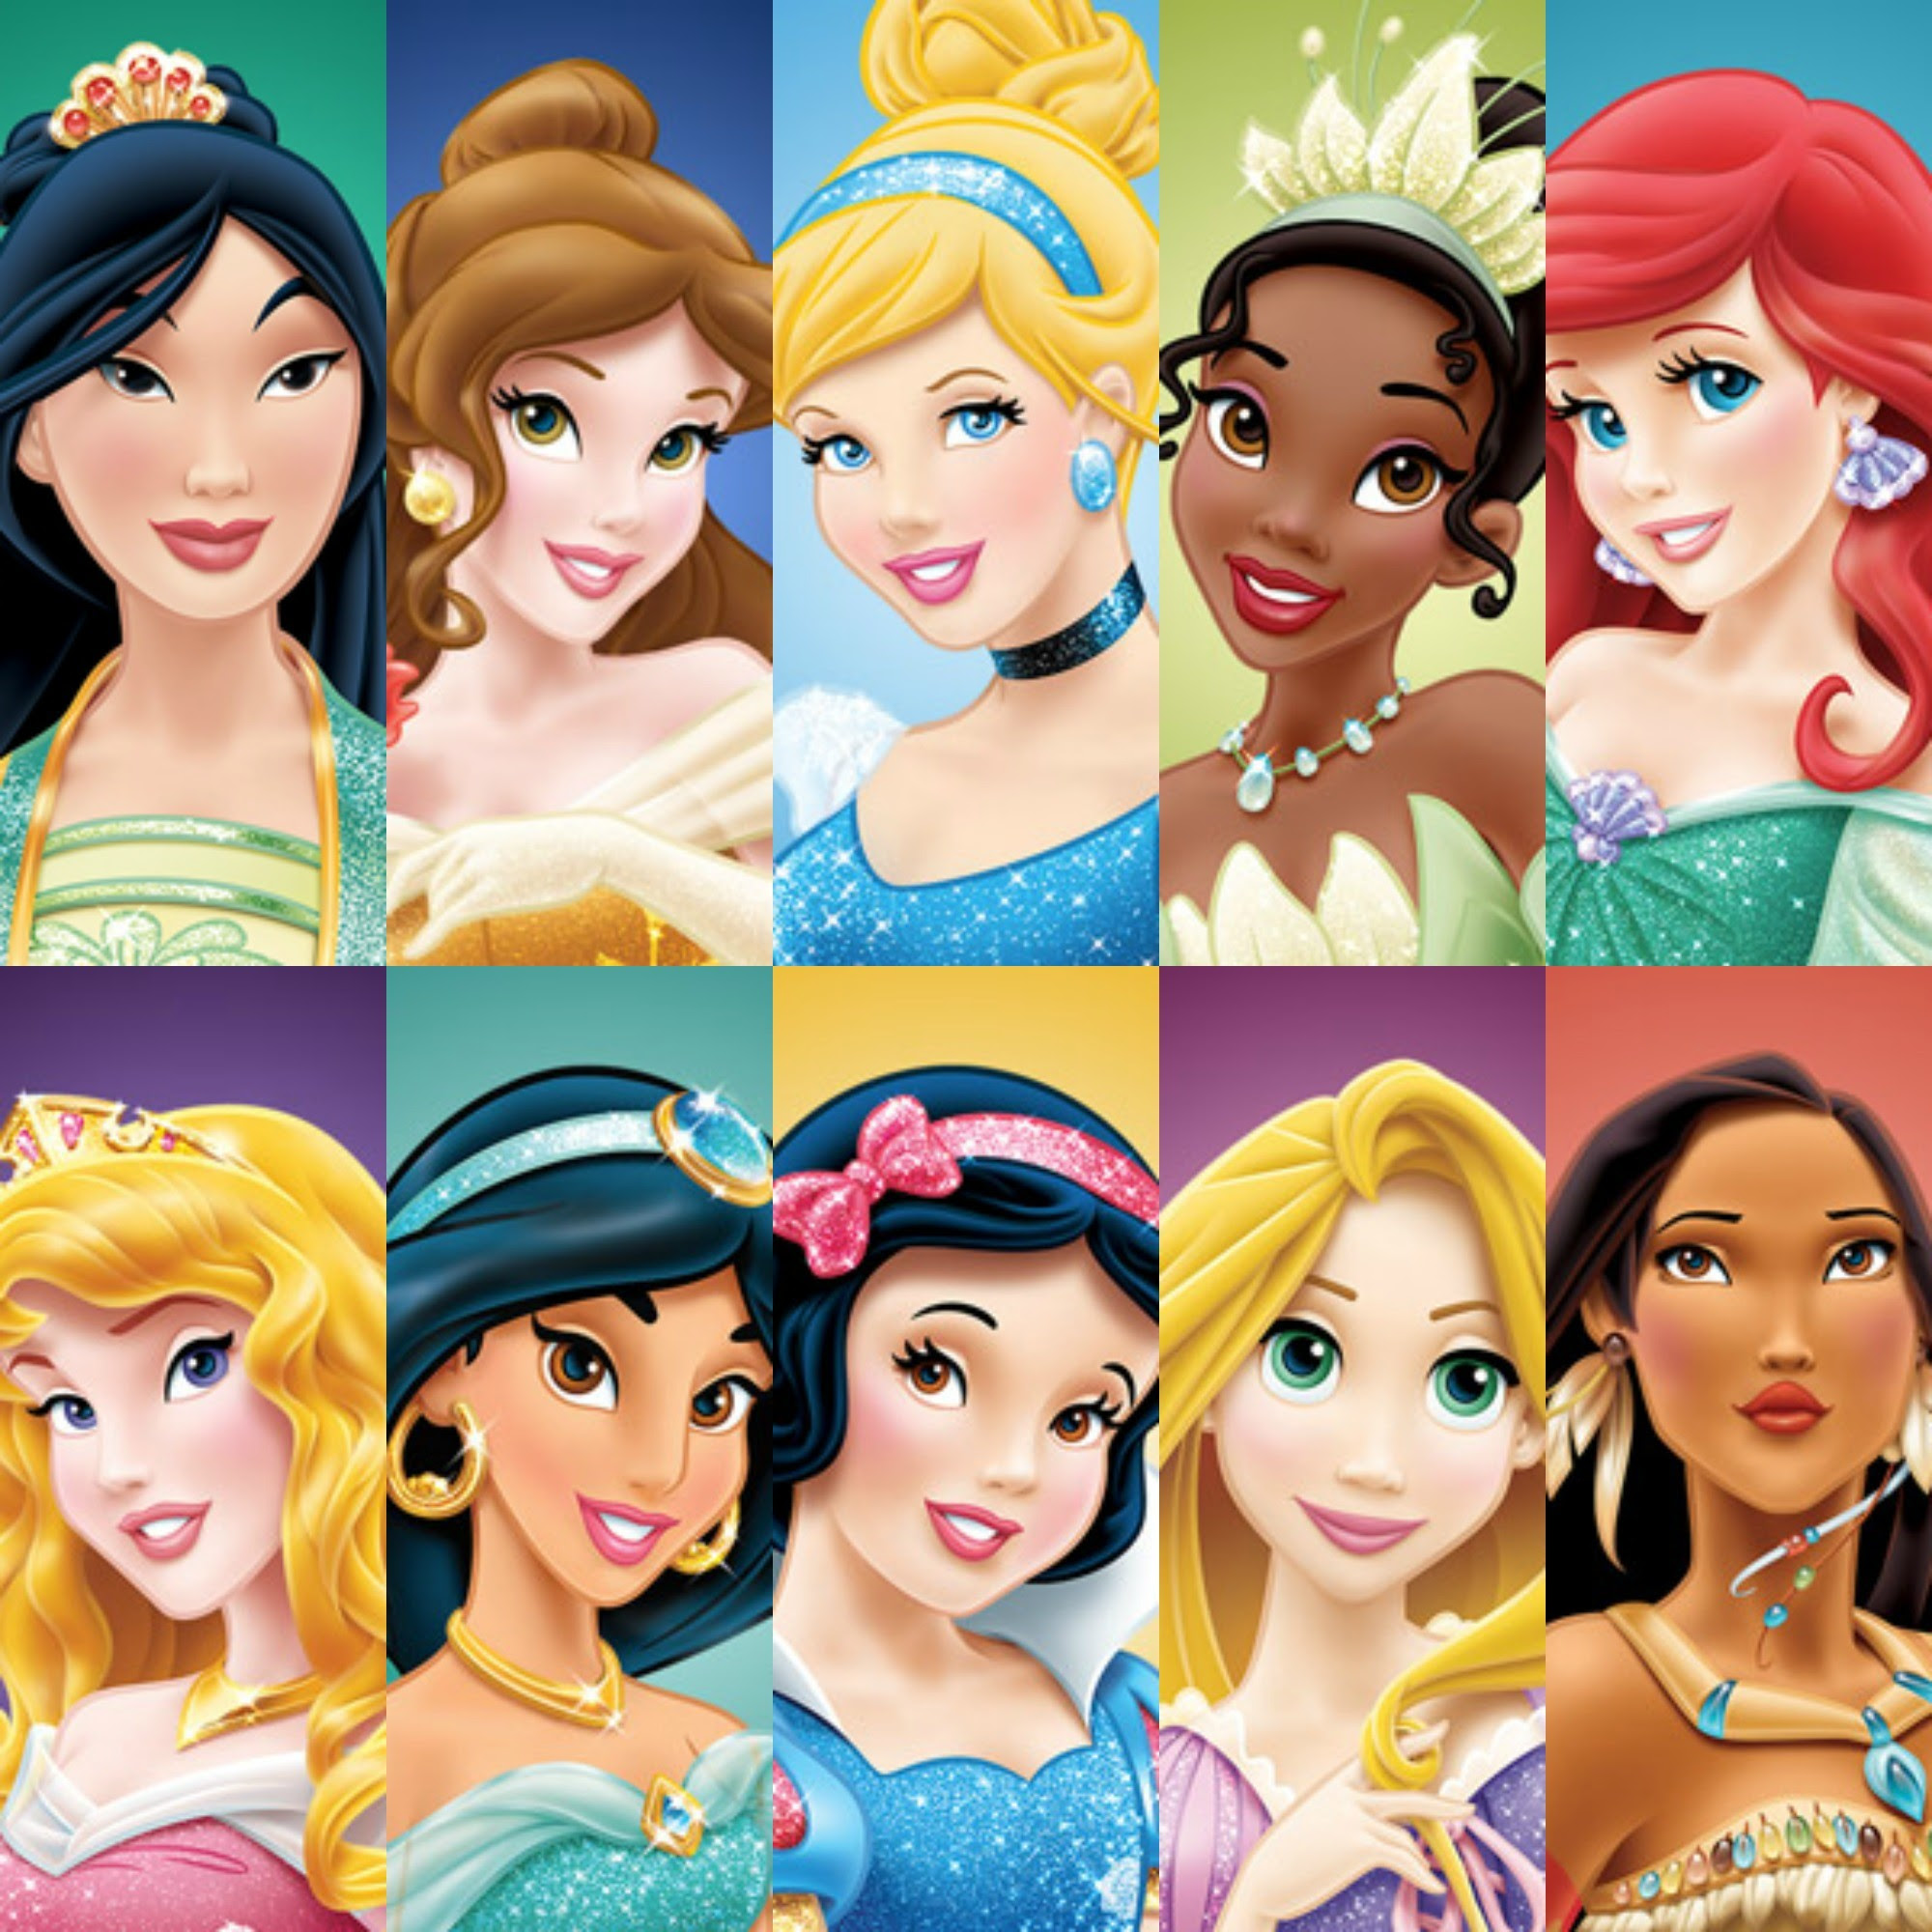 Disney Princesses Wallpaper 55 Images